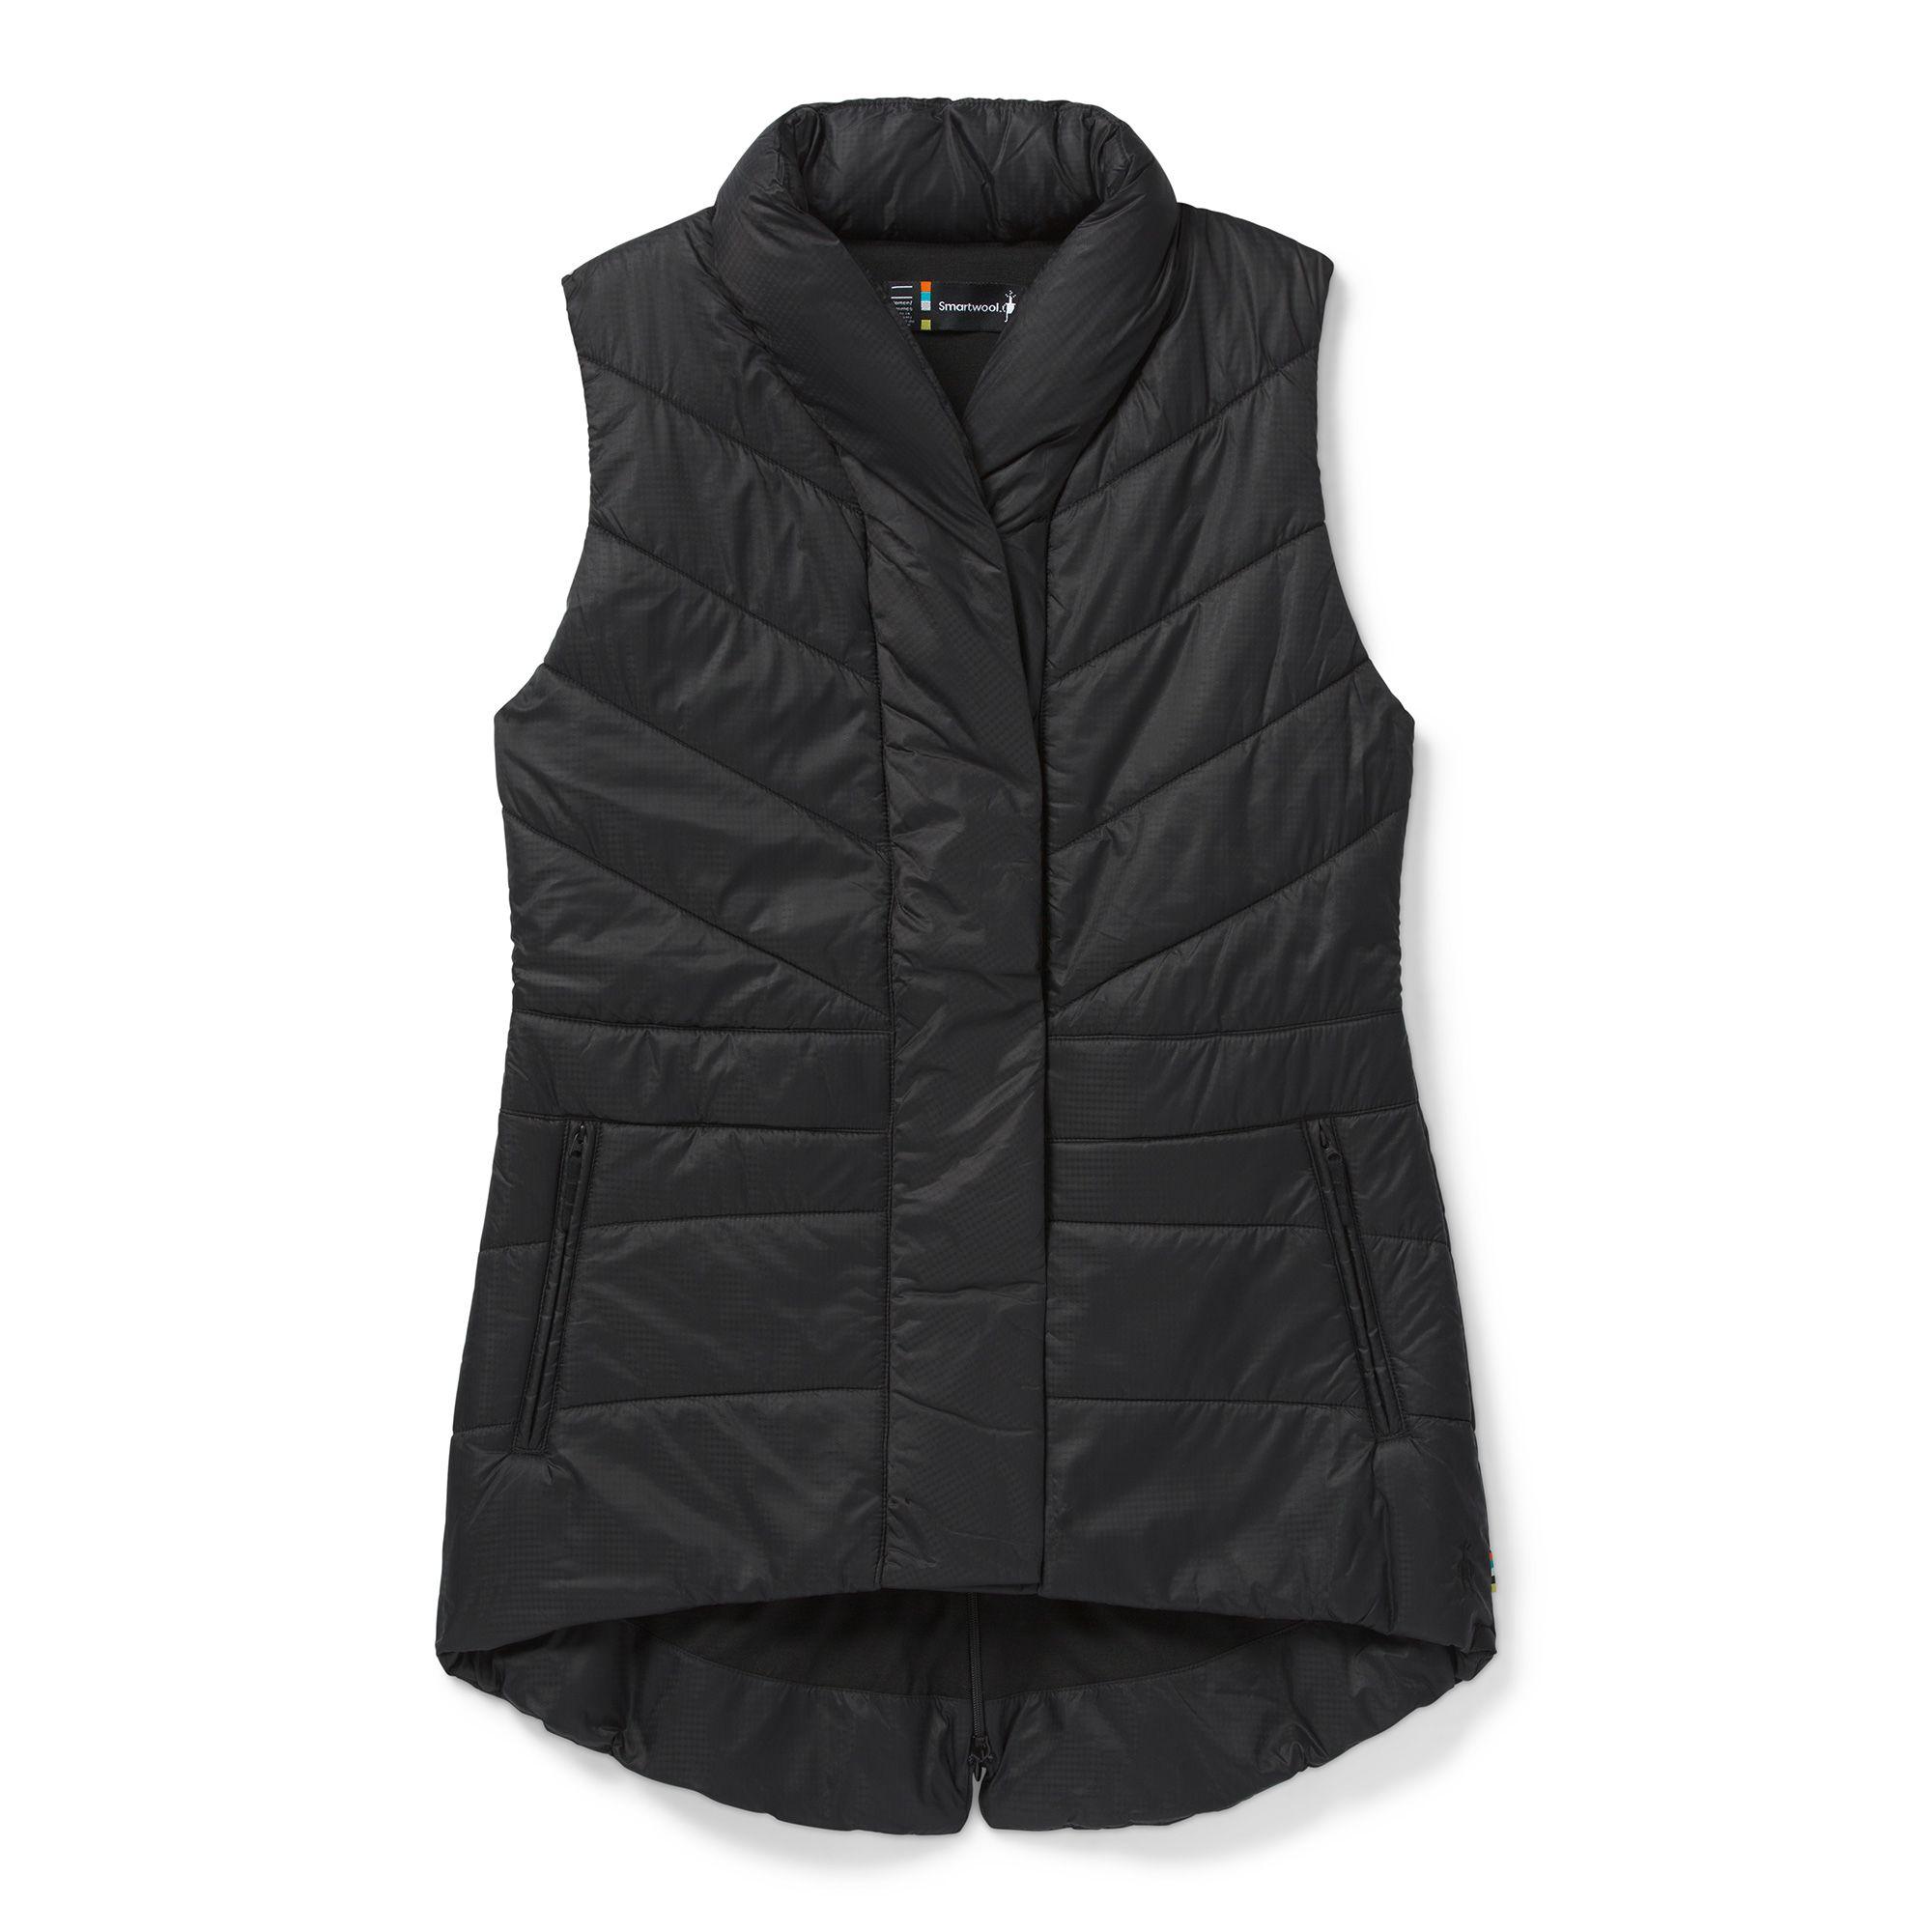 Women's Smartloft 150 Vest